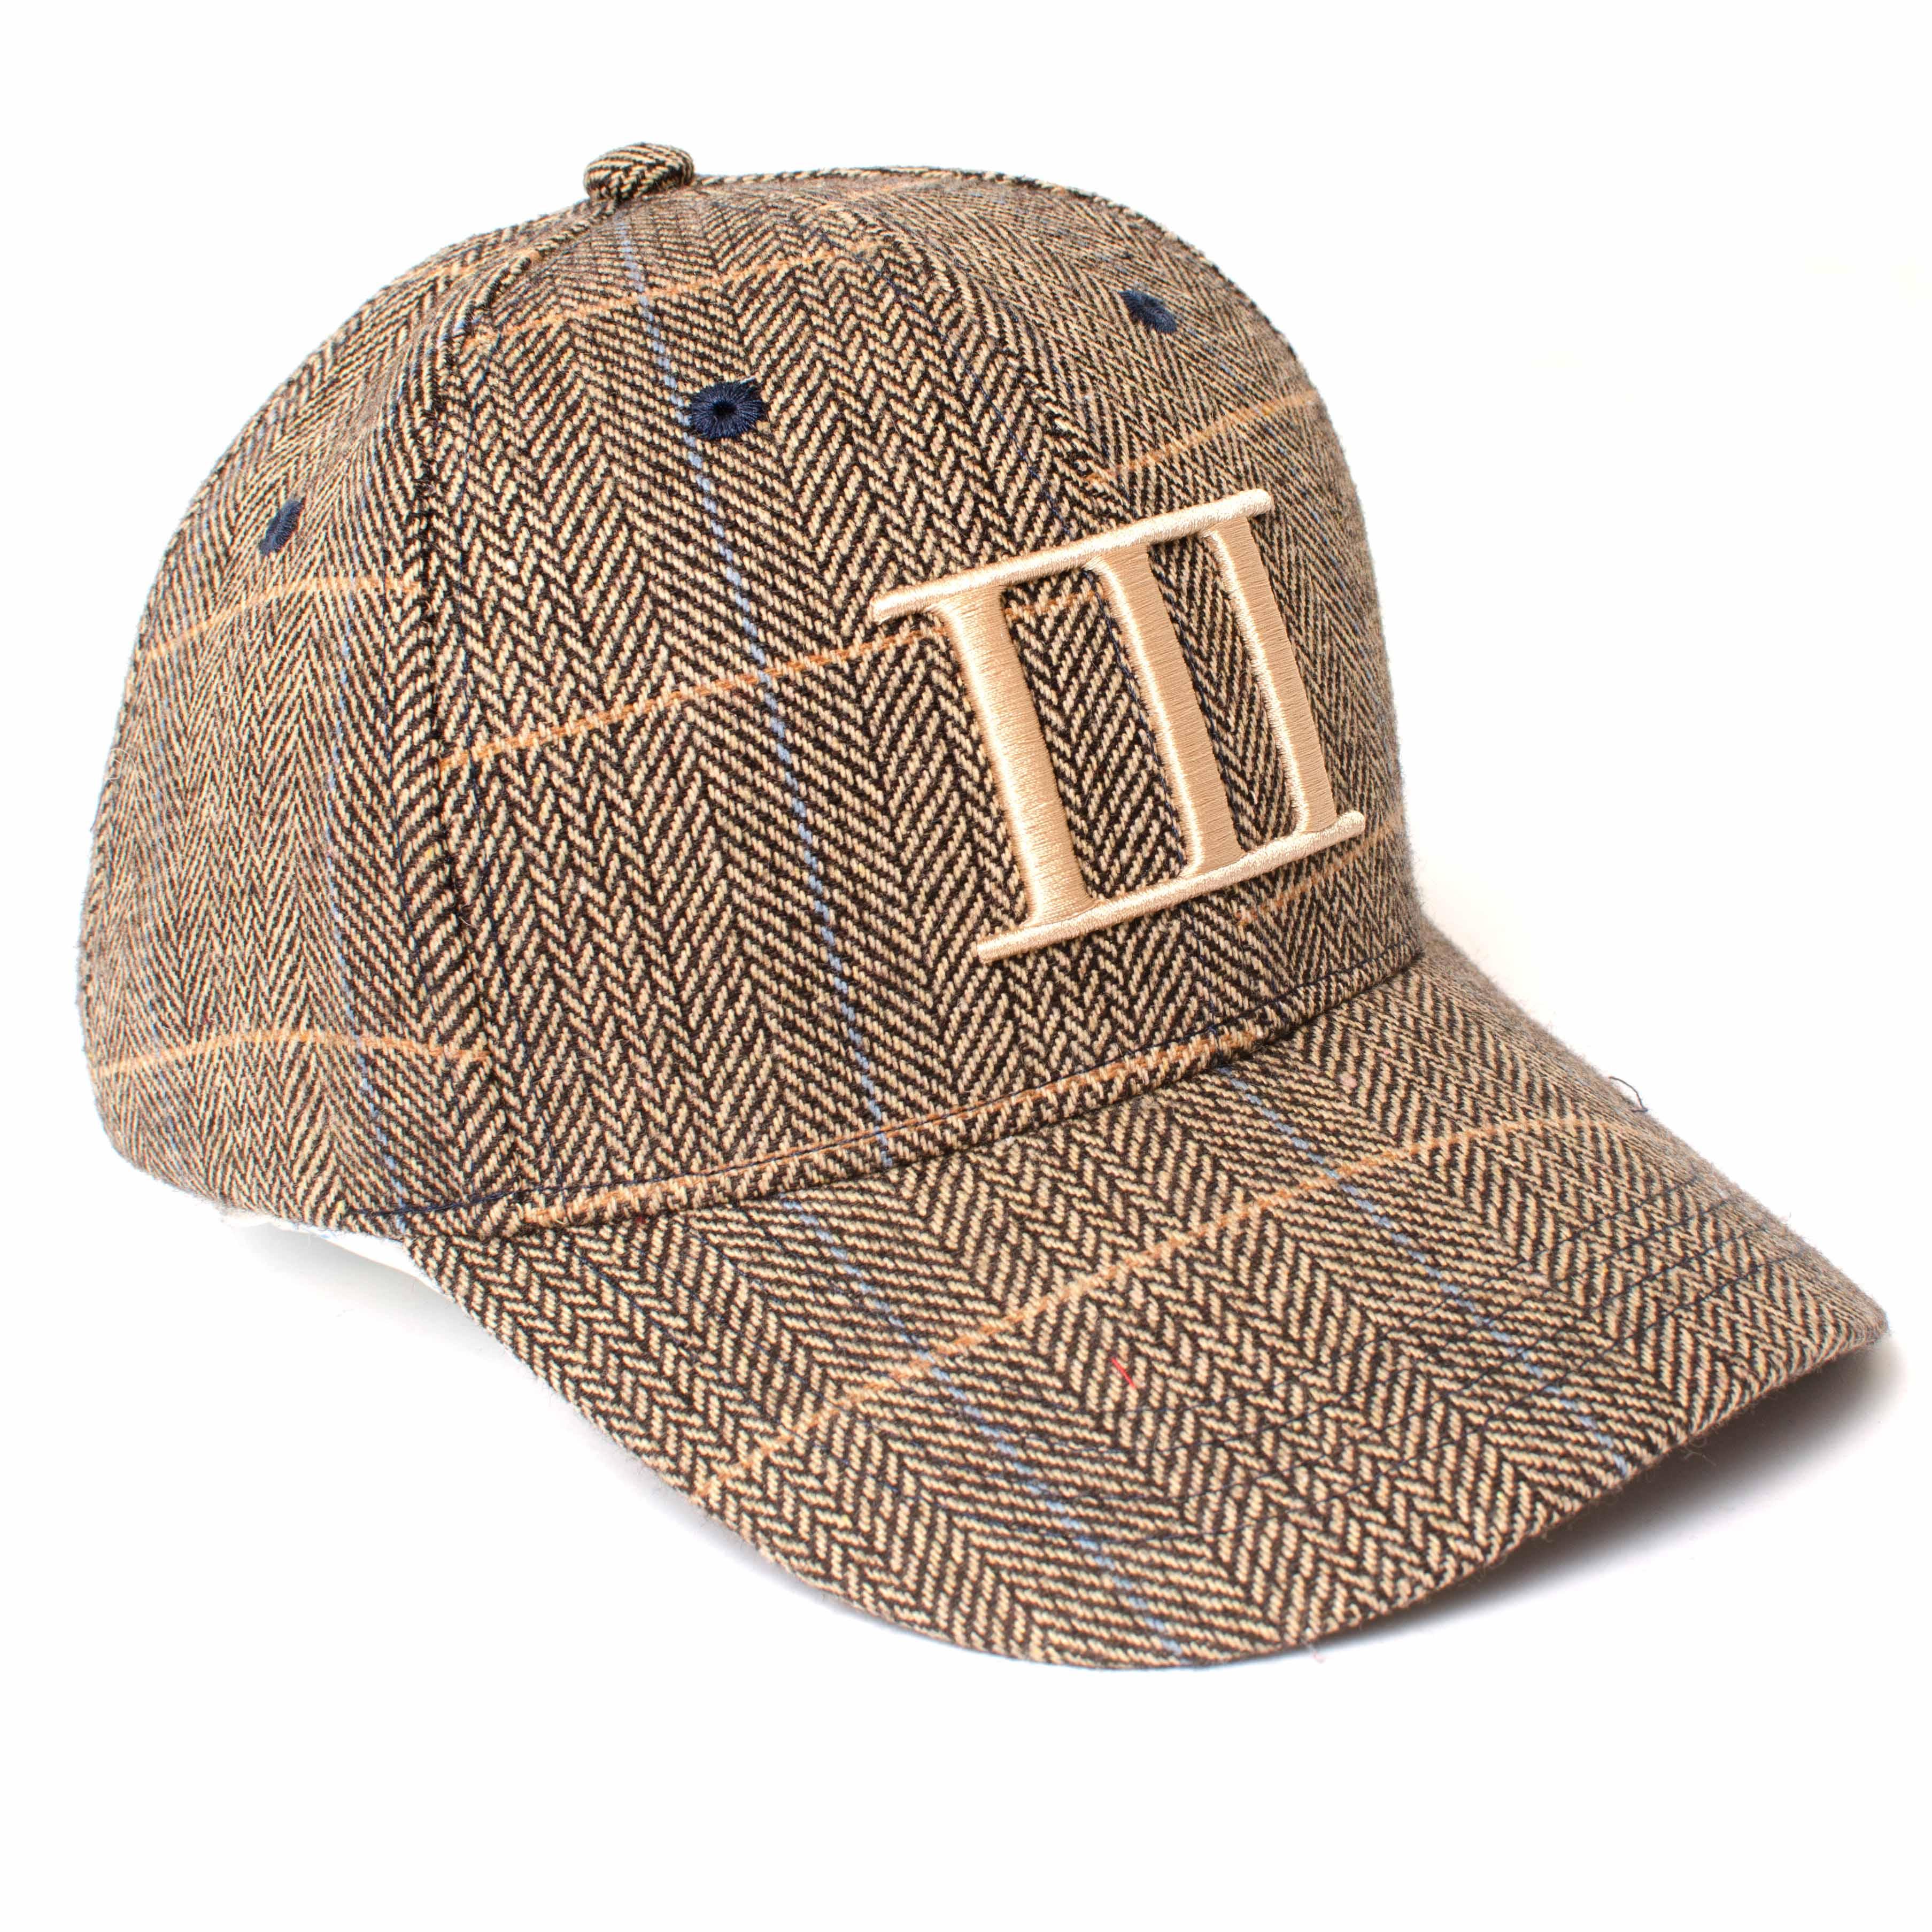 EGAN   Coffee colored baseball cap with herringbone pattern